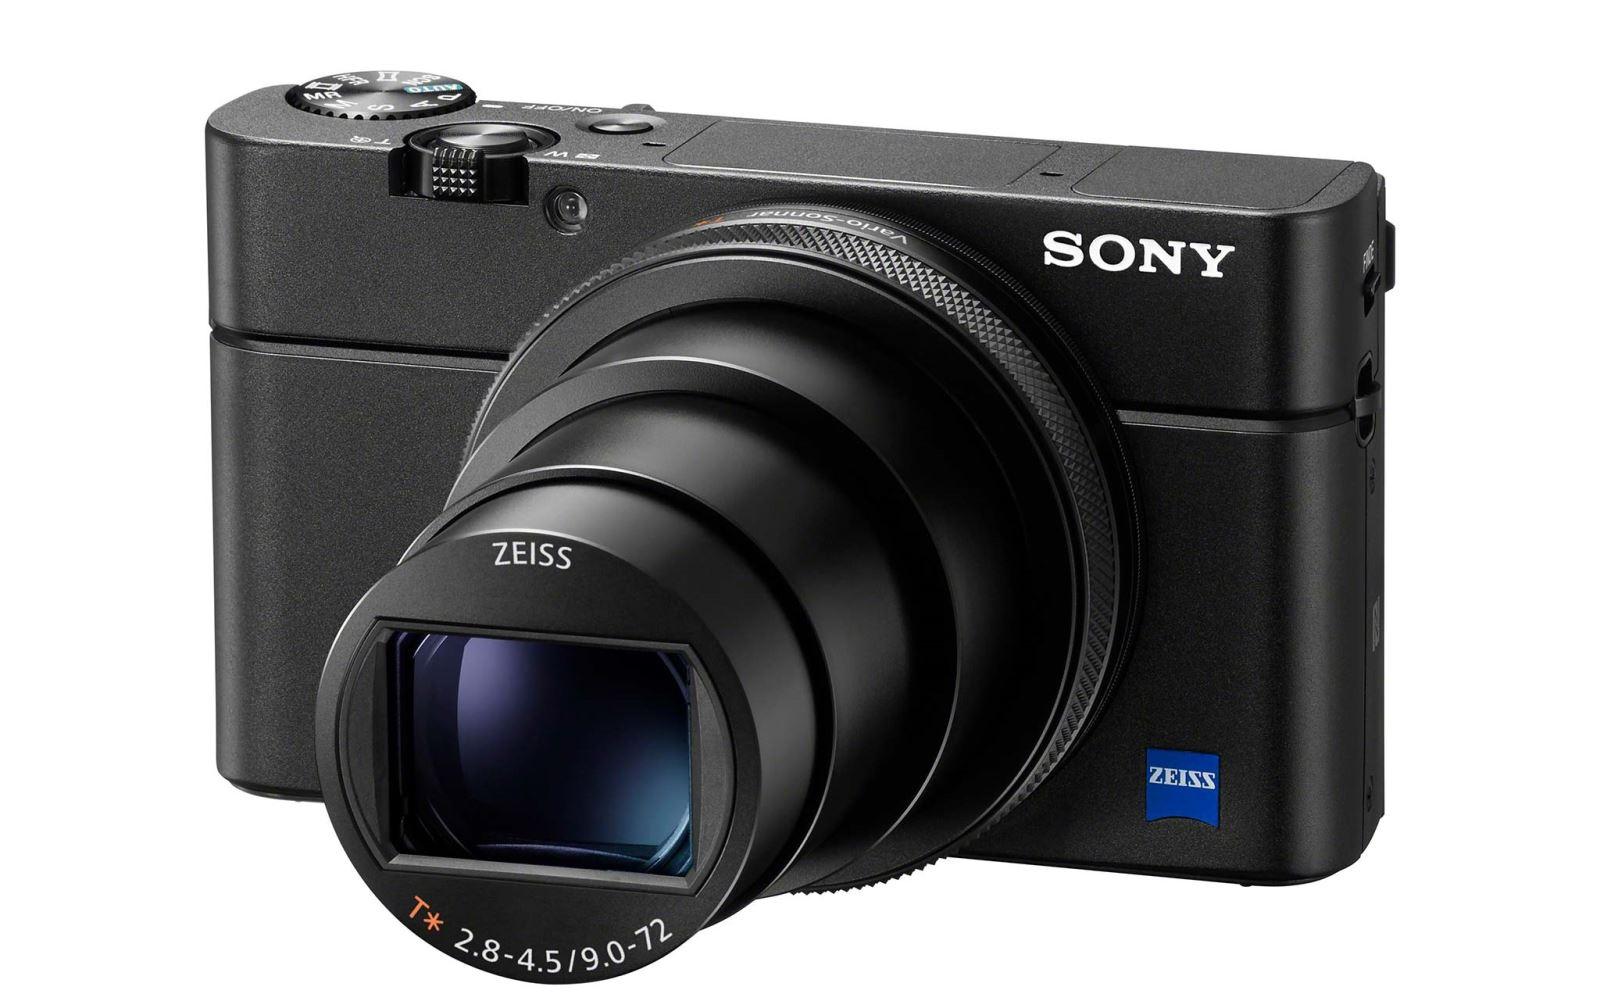 Sony Cyber-shot DSC-RX100 VII M7